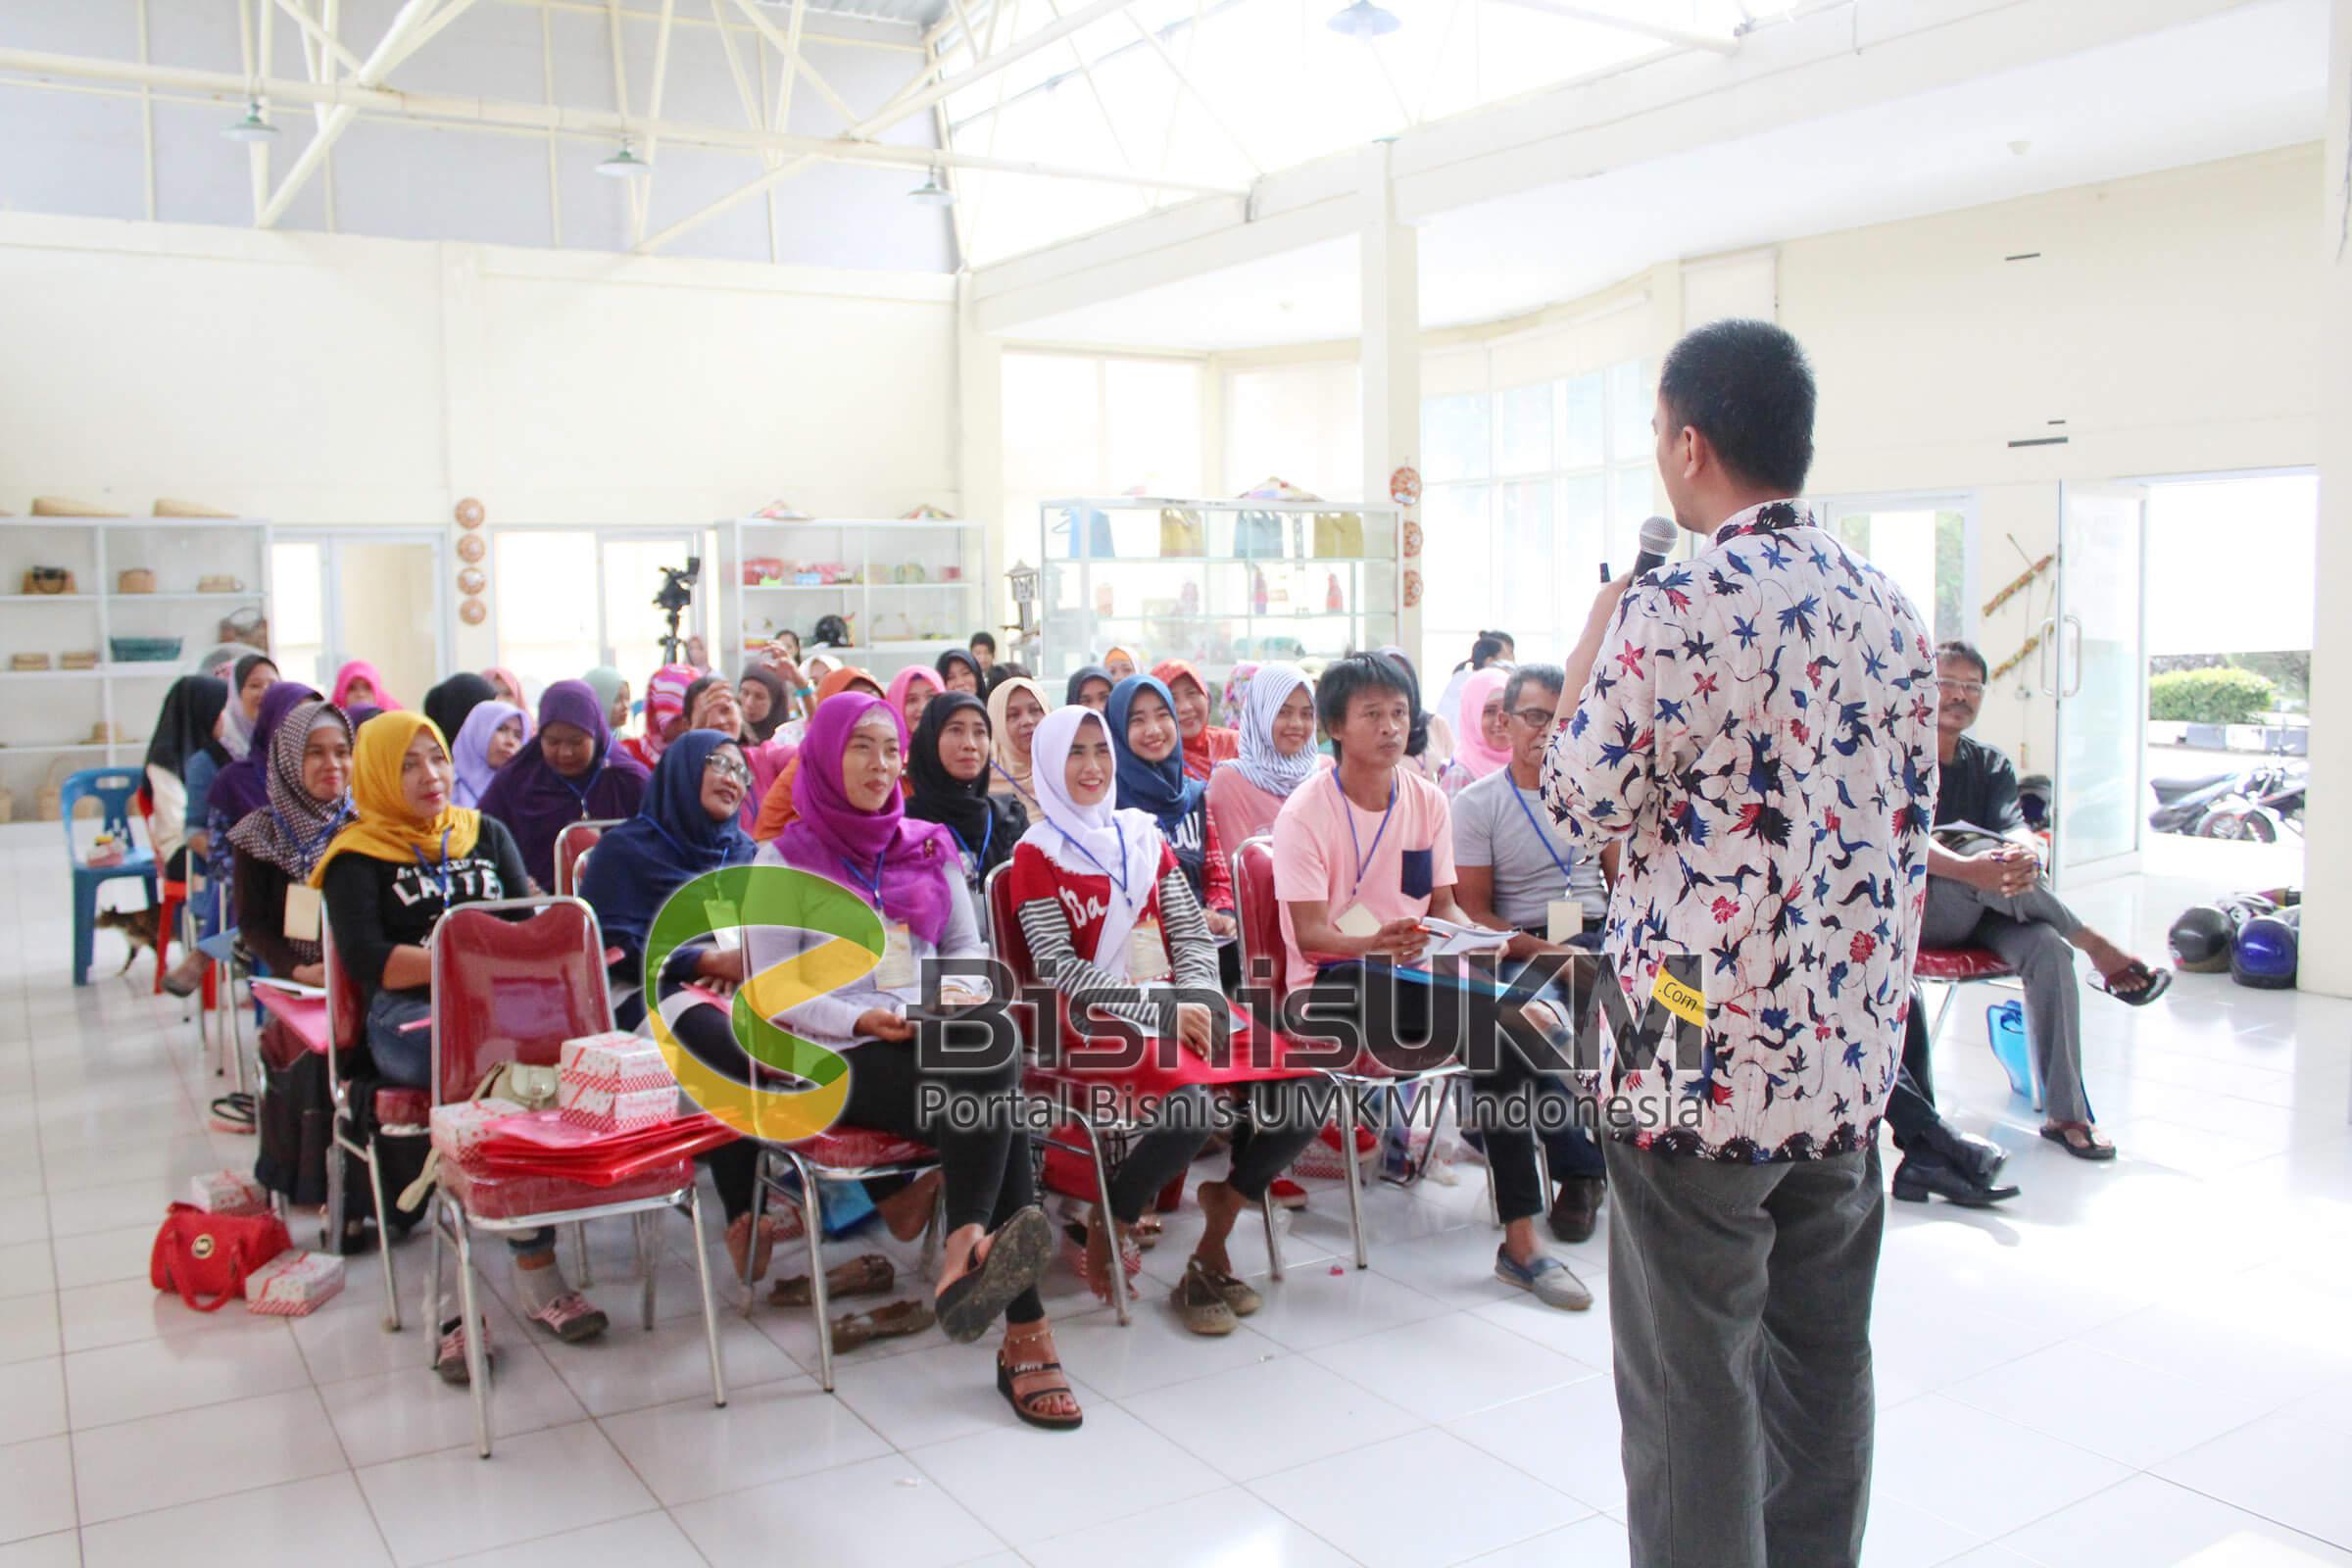 Pelatihan budidaya jamur diikuti oleh 50 orang peserta yang terdiri dari masyarakat di Kabupaten Nunukan